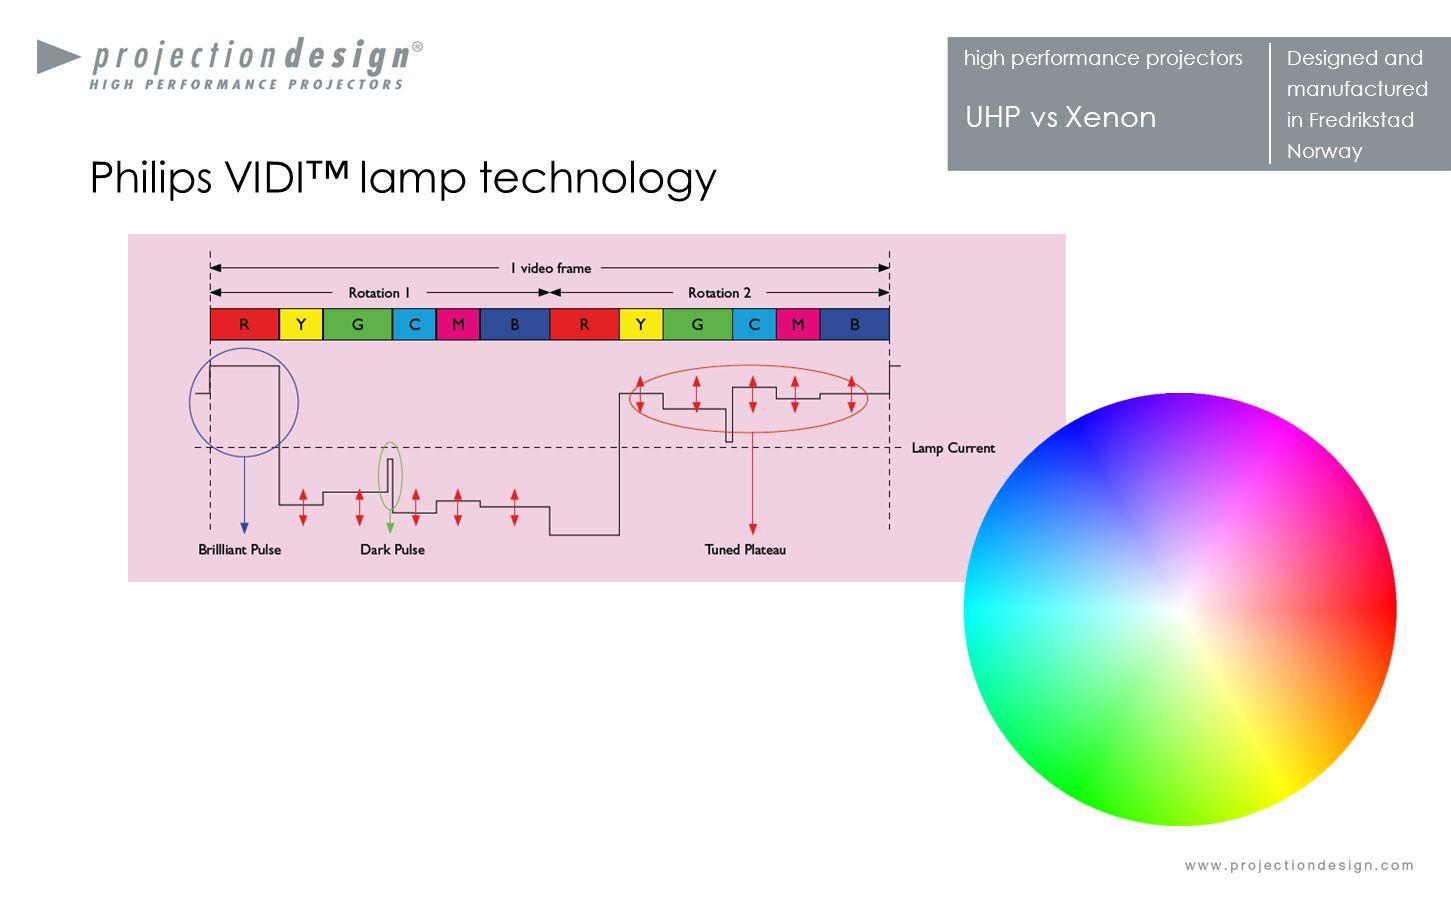 Philips VIDI™ lamp technology